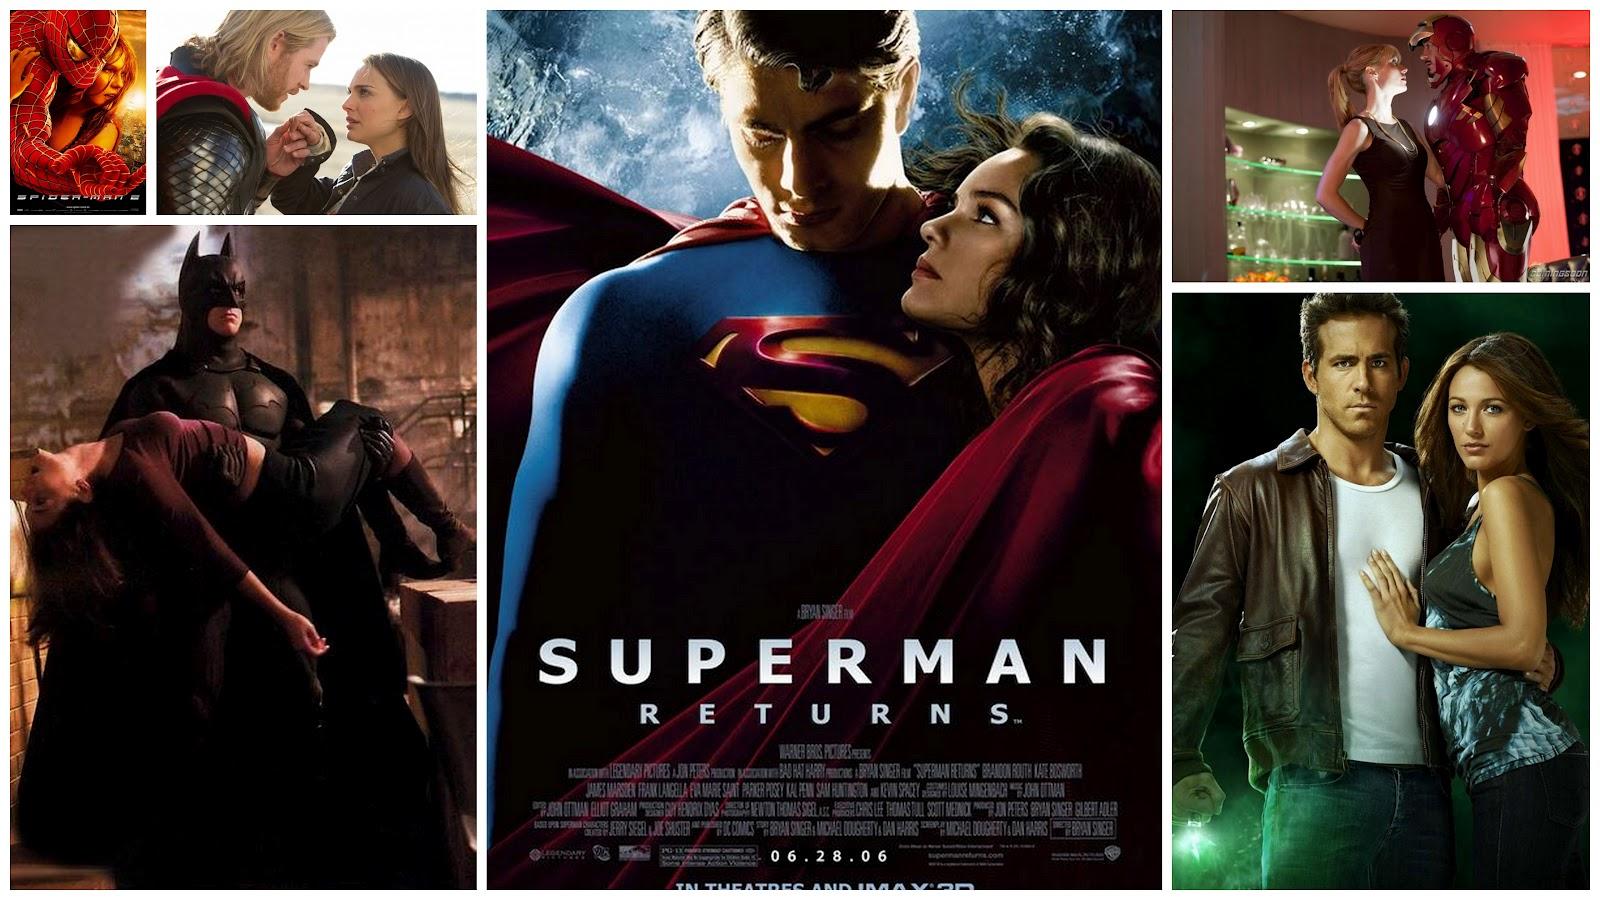 From Top Down Left To Right Spiderman Thor Batman Begins Superman Returns Iron Man 2 Green Lantern